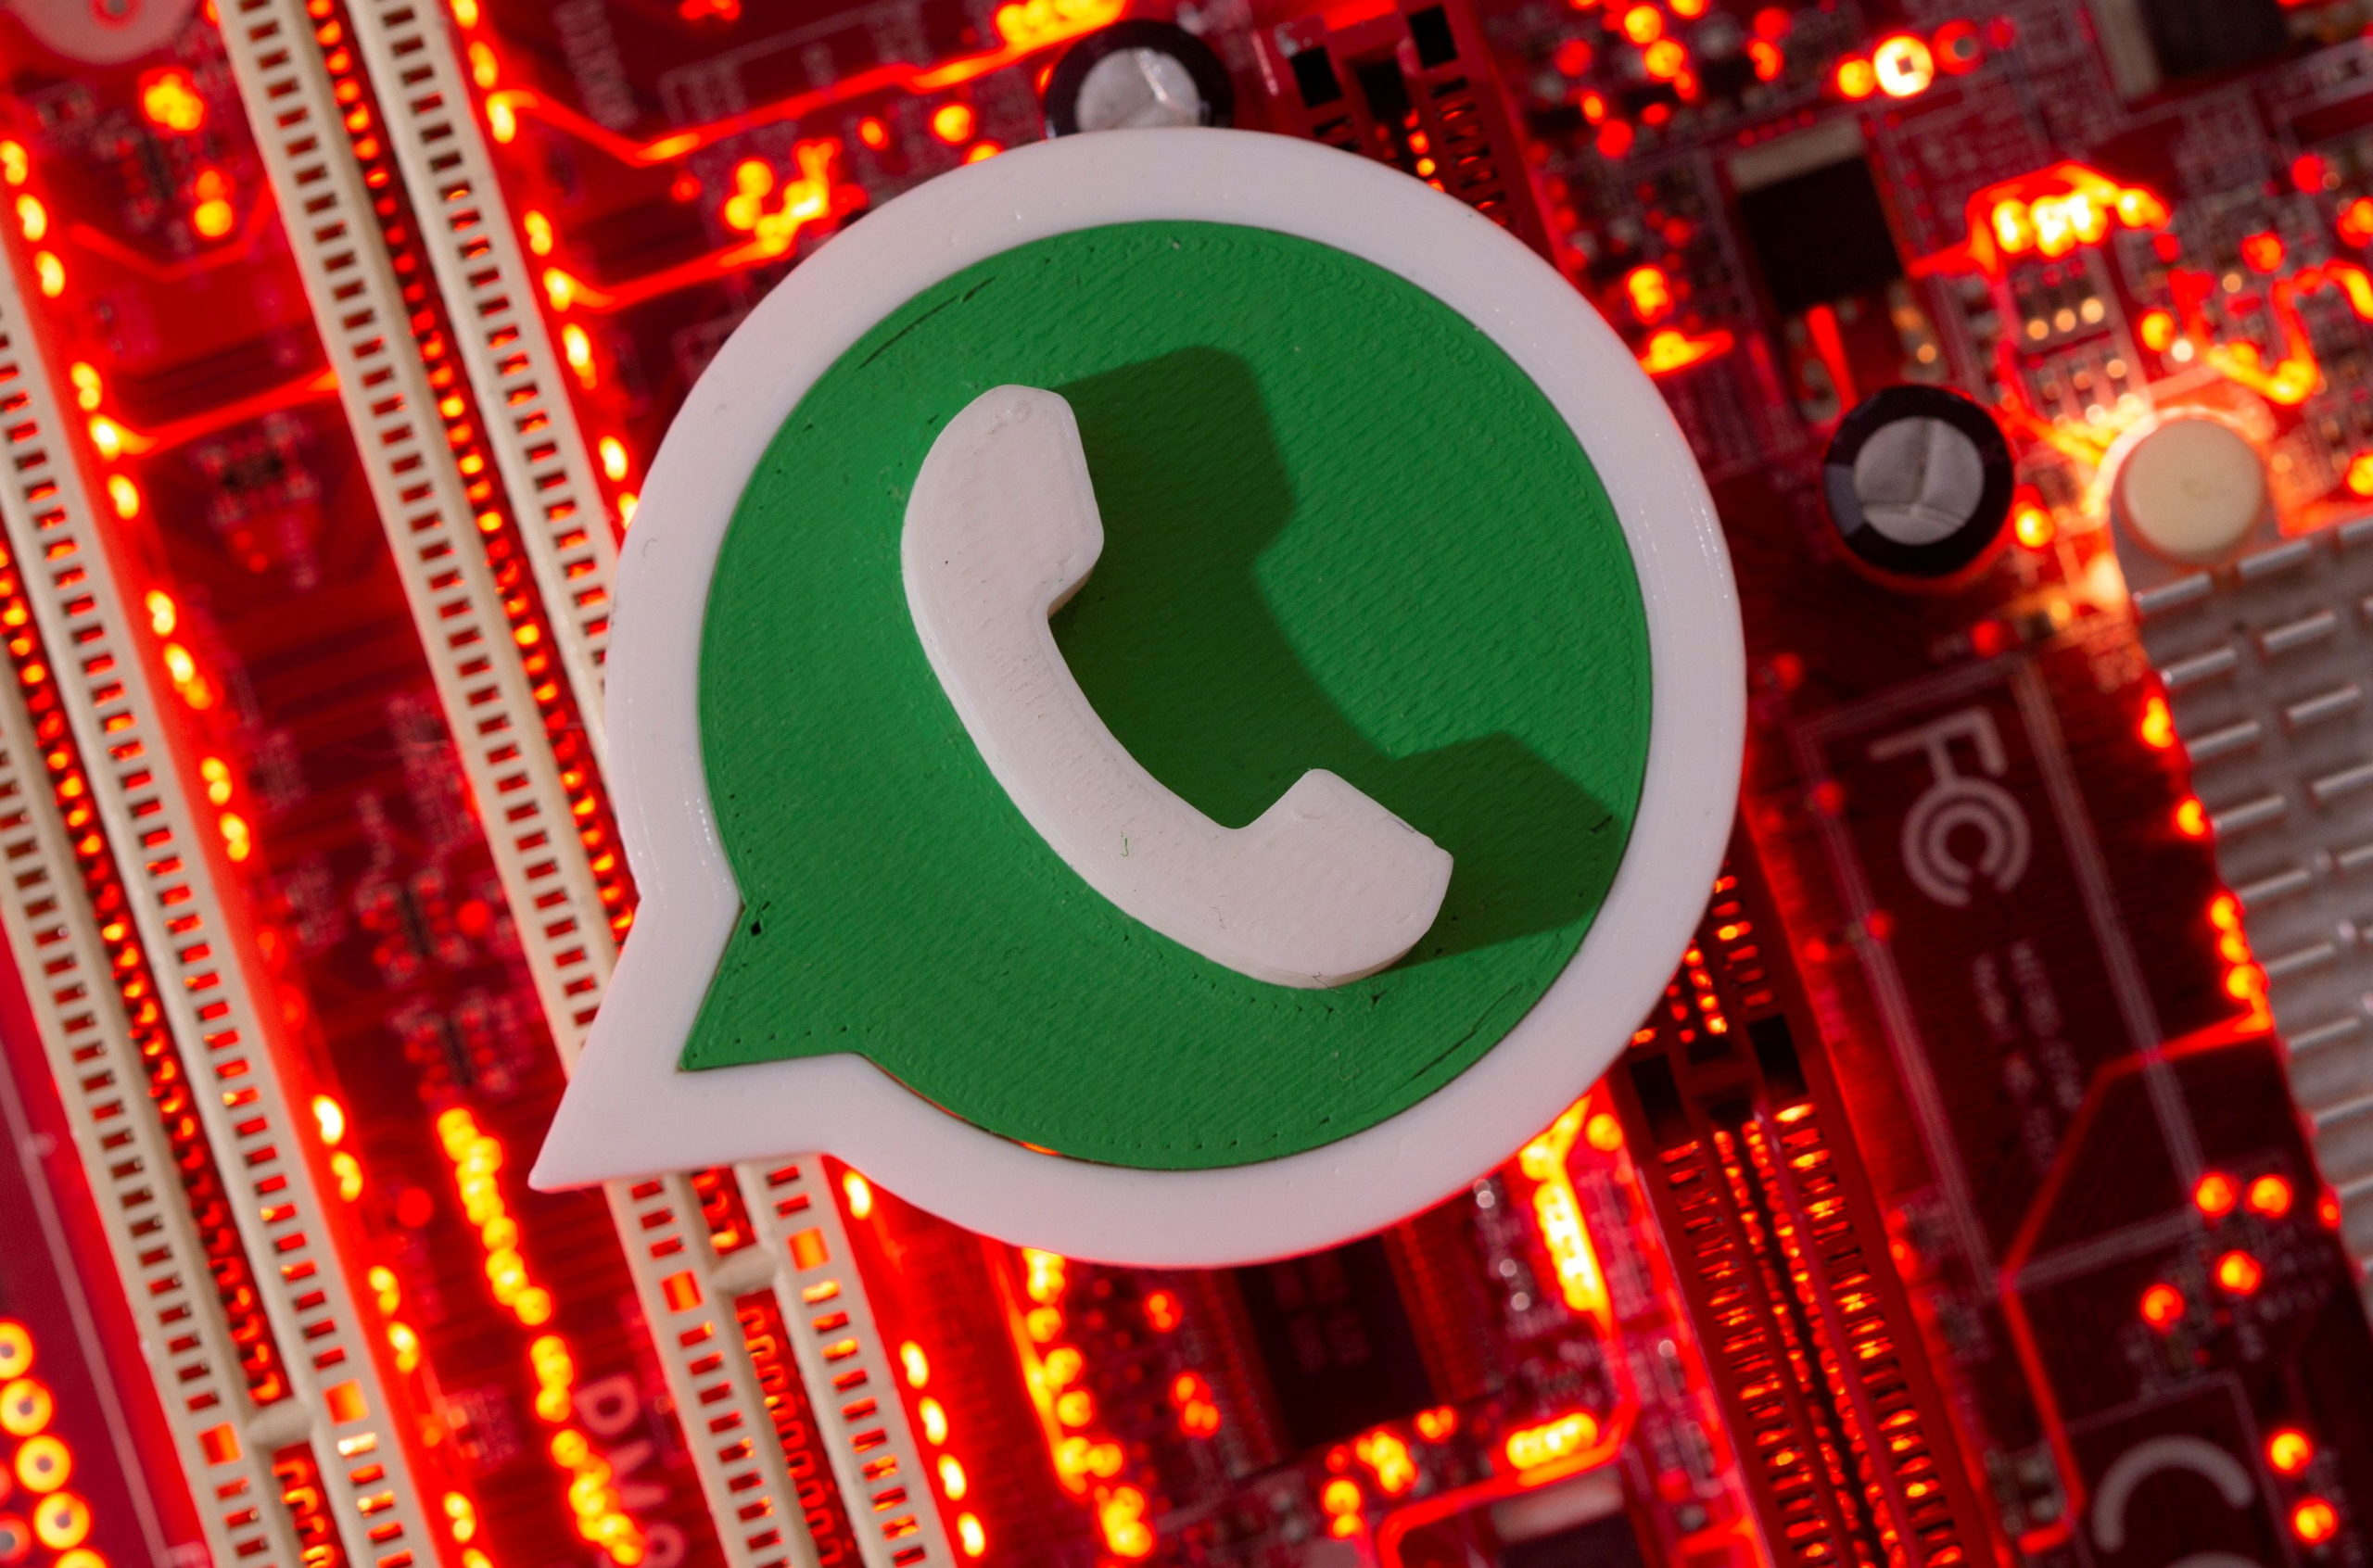 Compania Kaspersky avertizeaza asupra ultimelor metode de frauda prin intermediul WhatsApp